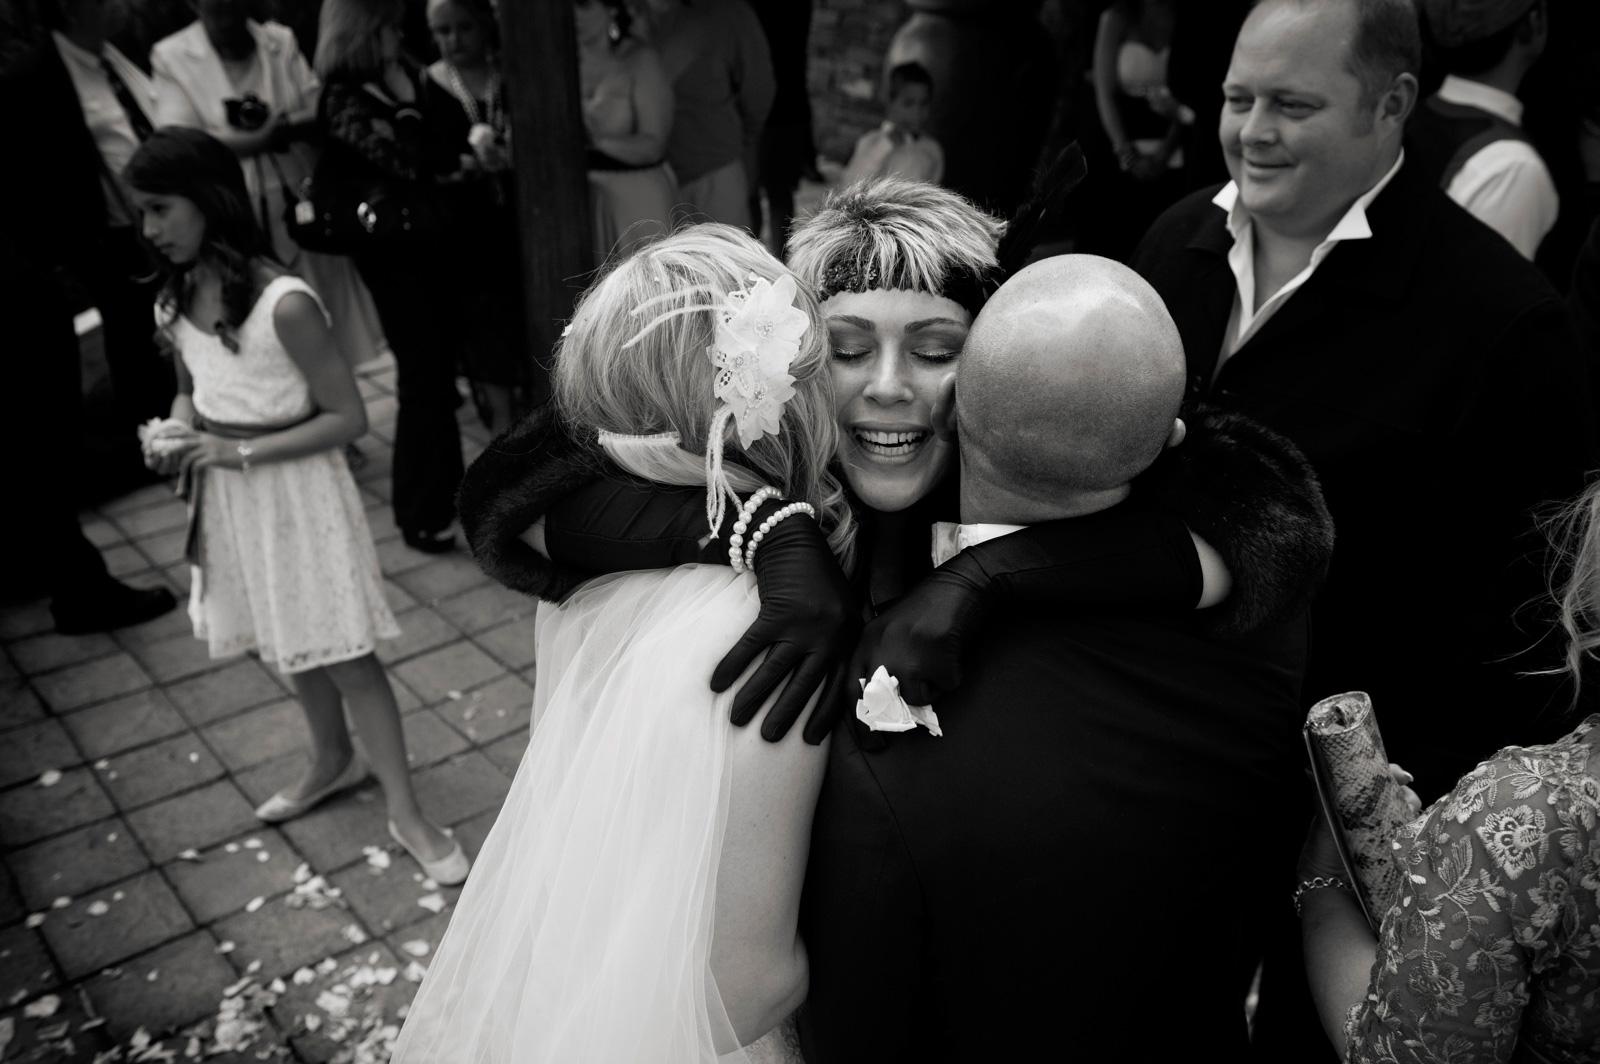 Congrats at Greek wedding